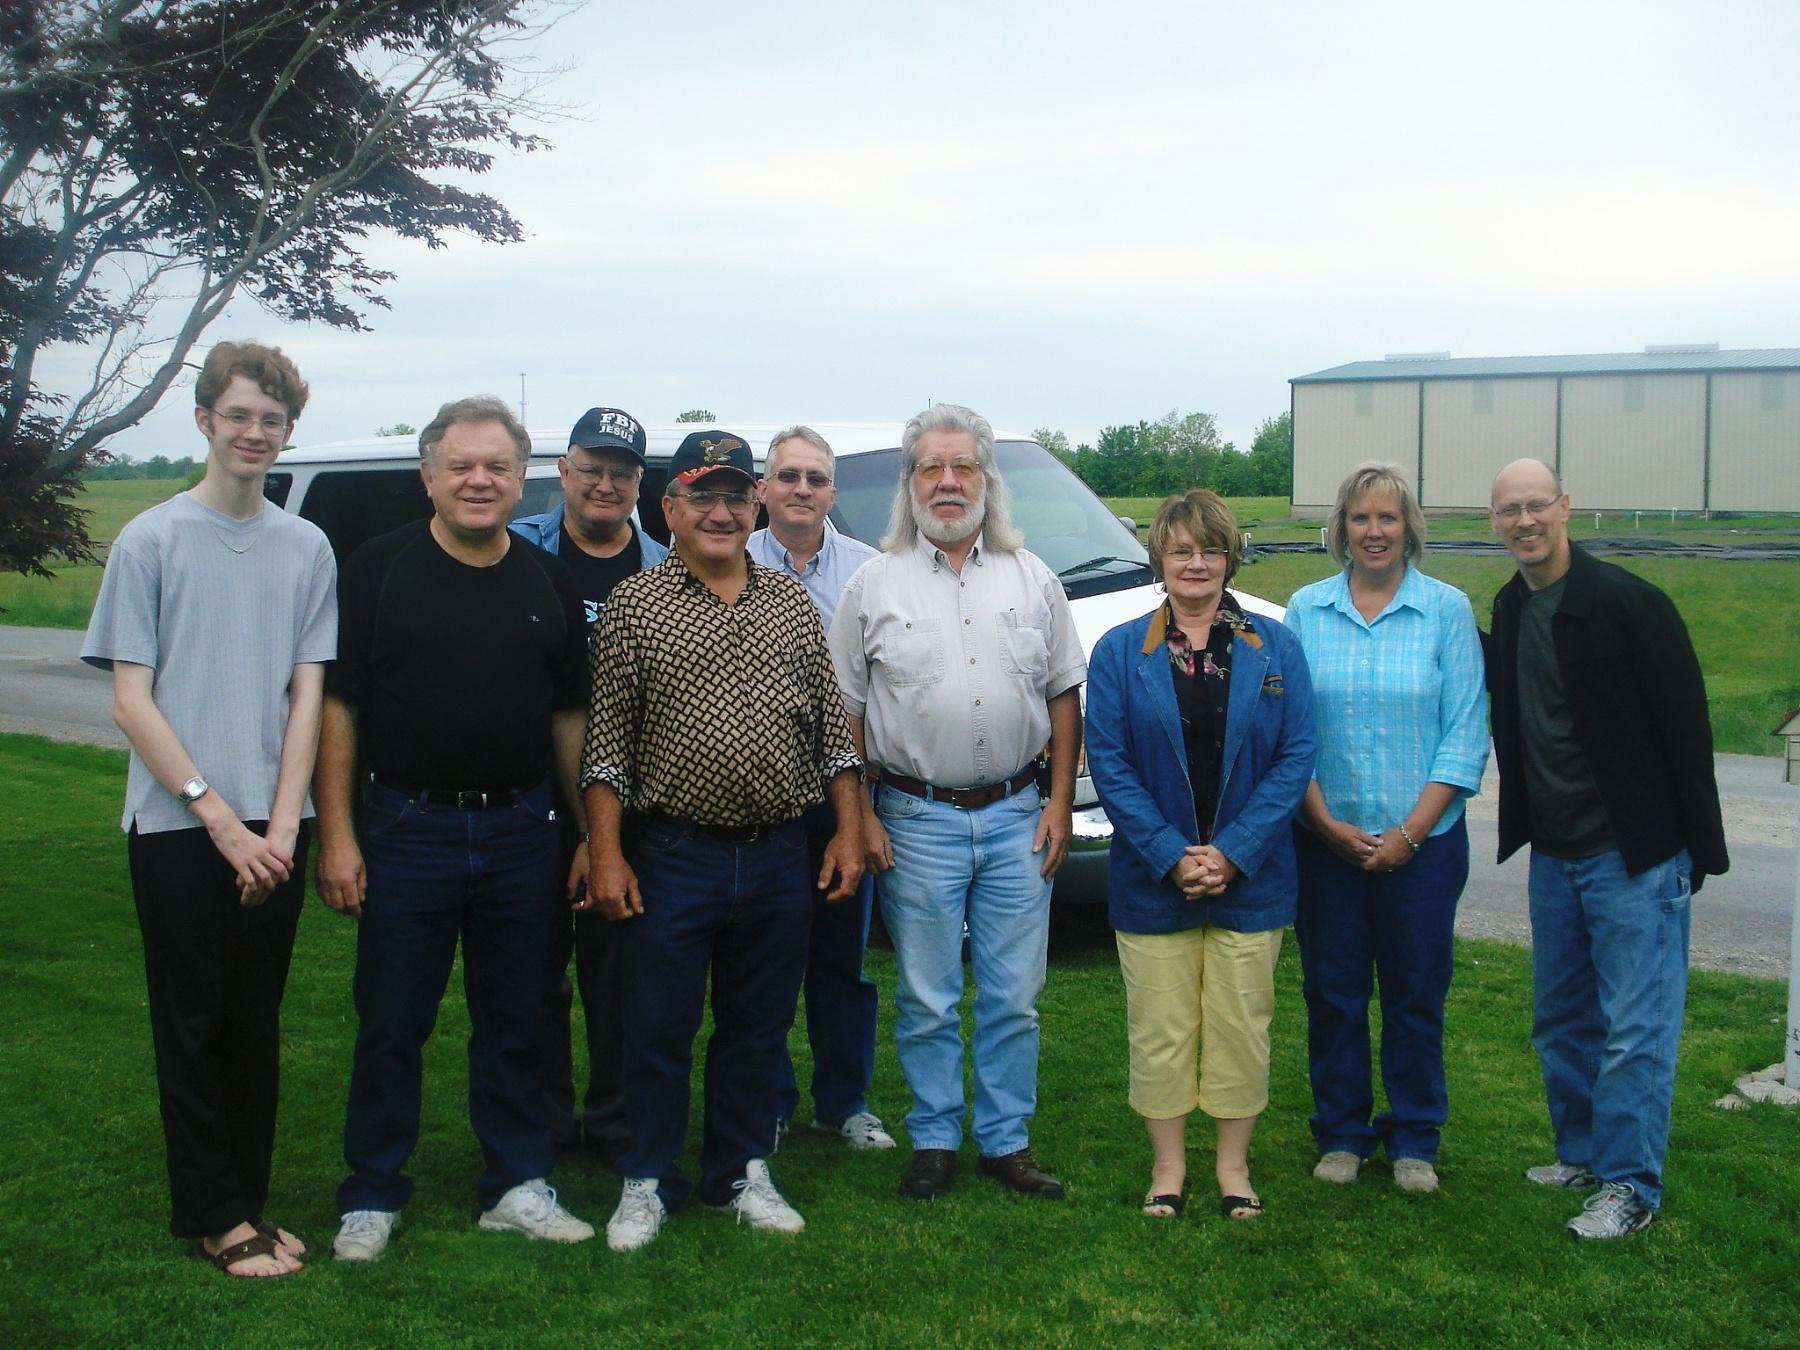 The Mississippi Mercy Road Team:(L-R) Isaac Nesbit, James Nesbit, Myron Filkins, Daniel Brown, Timothy O'Rourke, Stan Pratt, Regina Shank, Anne Crane, Kingsley Walker